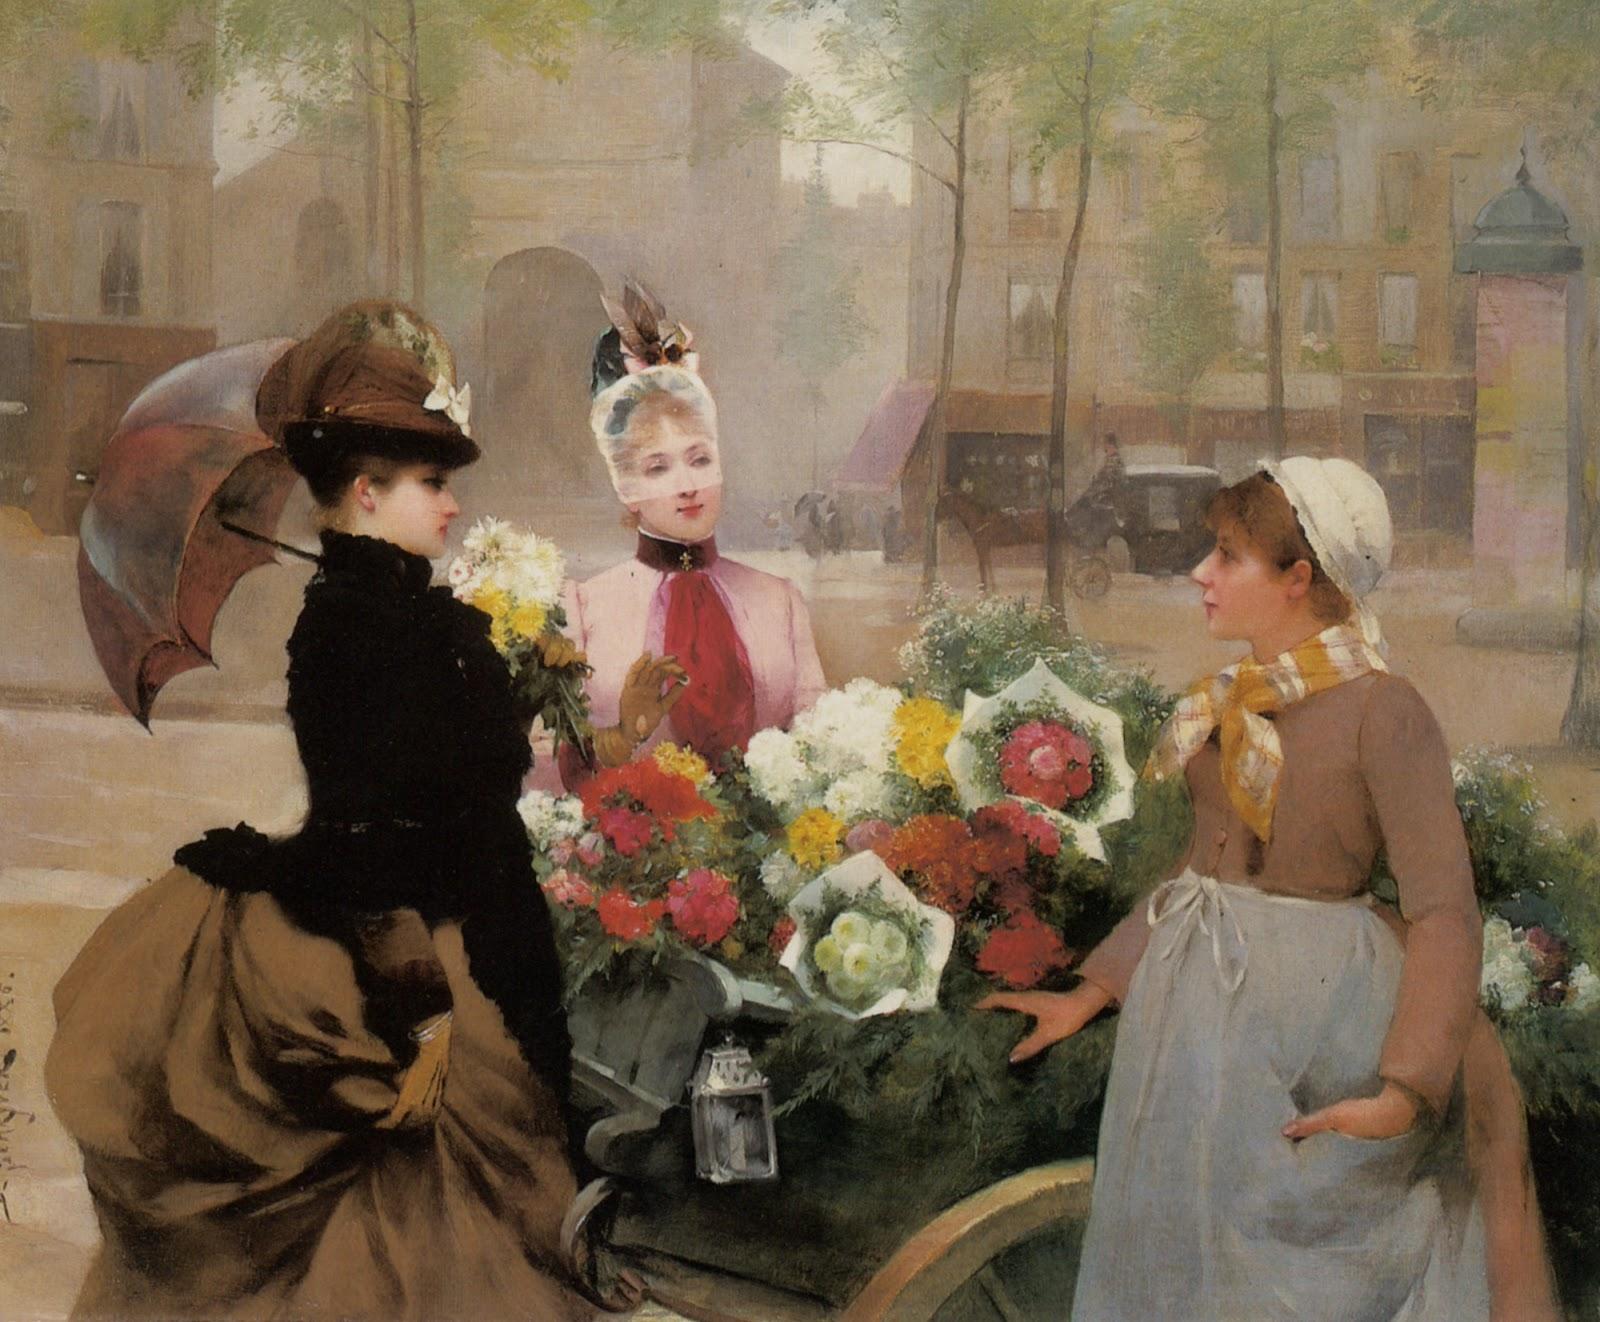 Louis de Schryver  The Flower Seller  La Belle poque  TuttArt  Pittura  Scultura